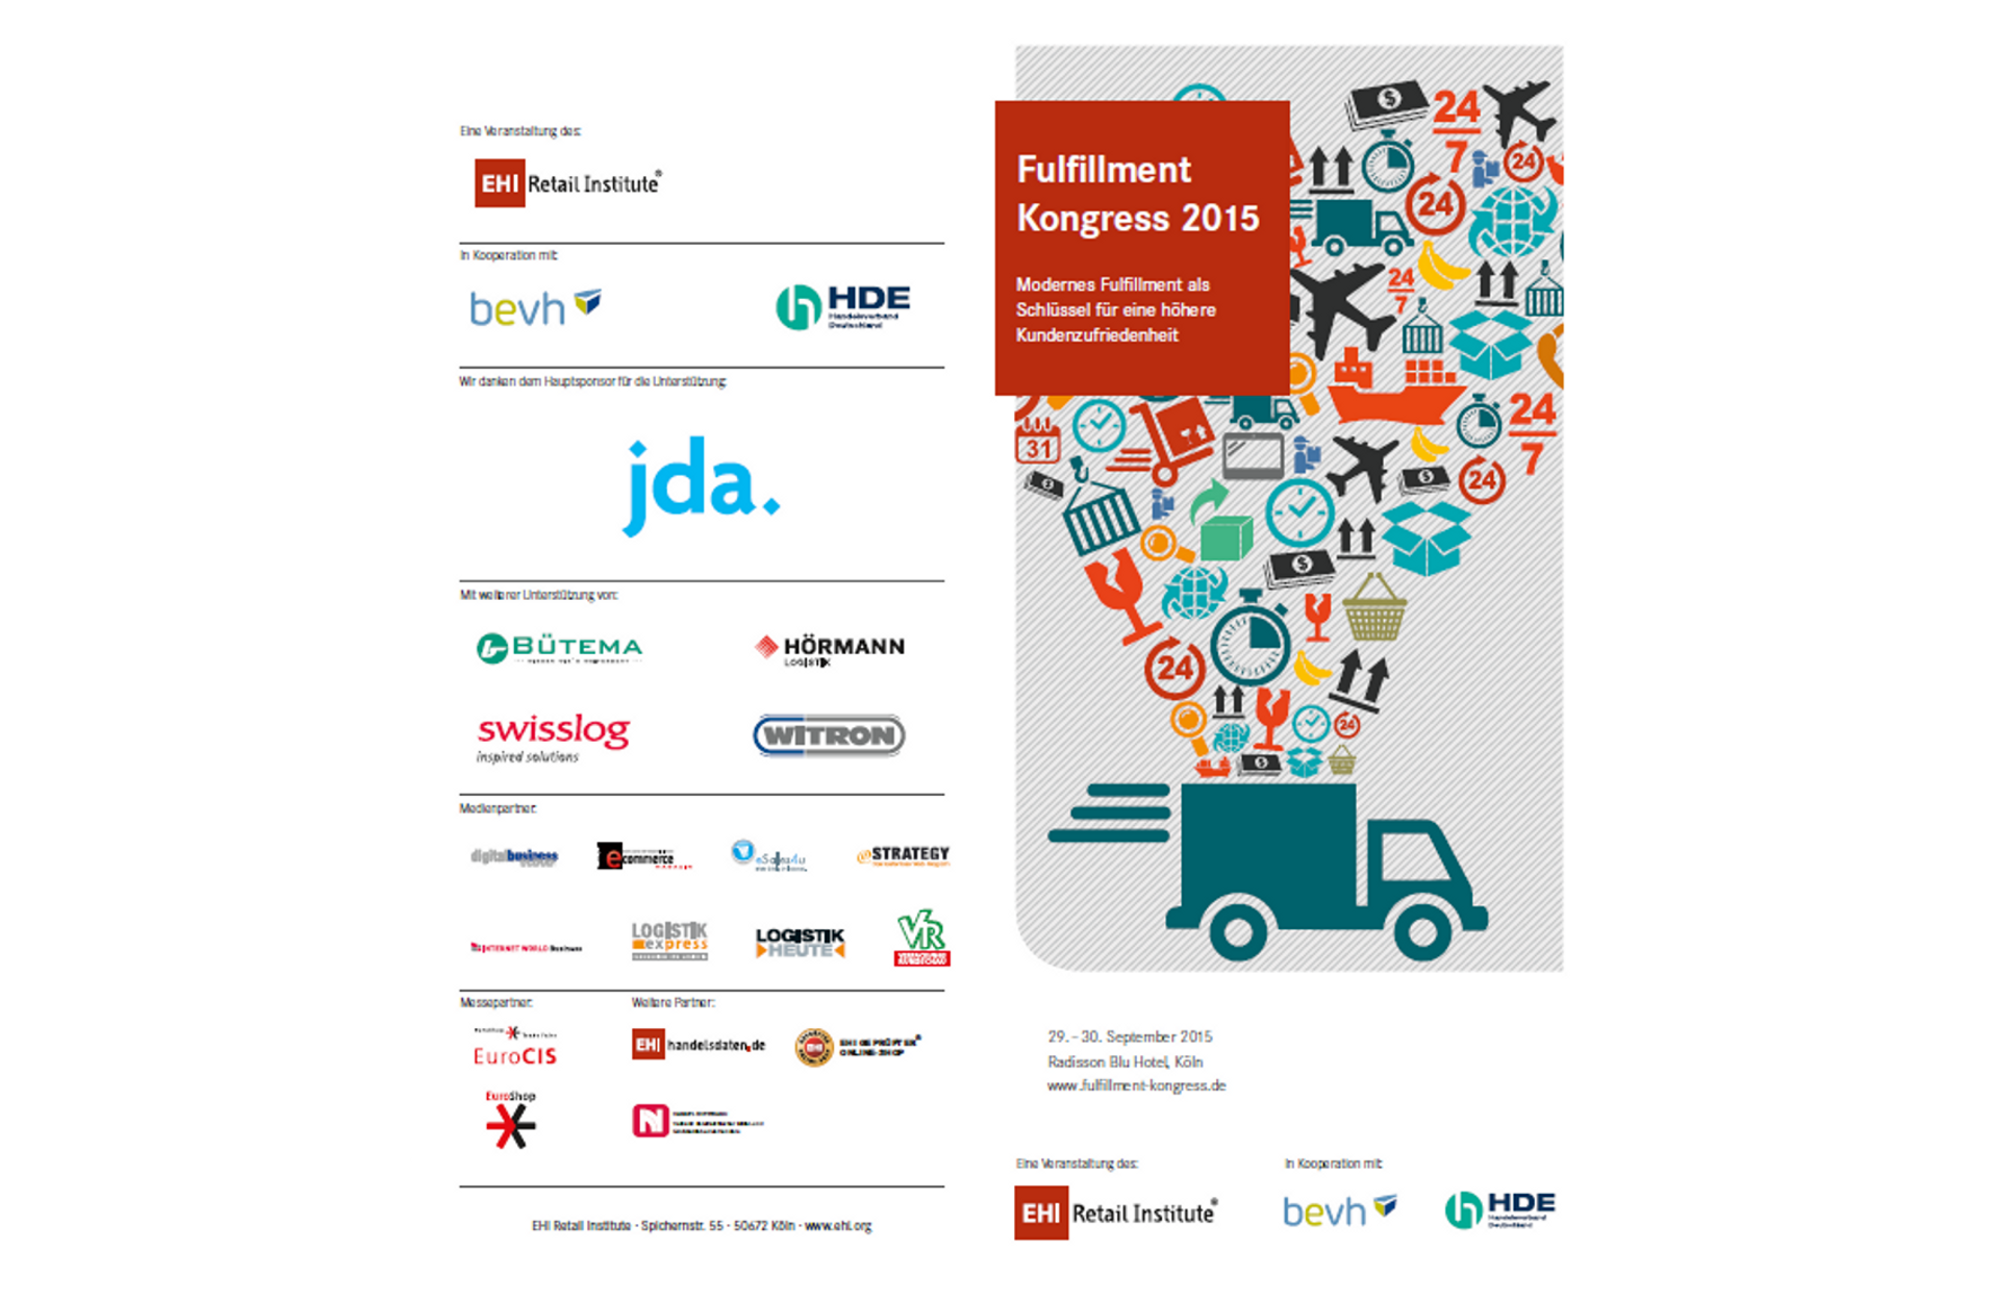 Flyer-Deckblatt_EHI_Fulfillment Kongress 2015